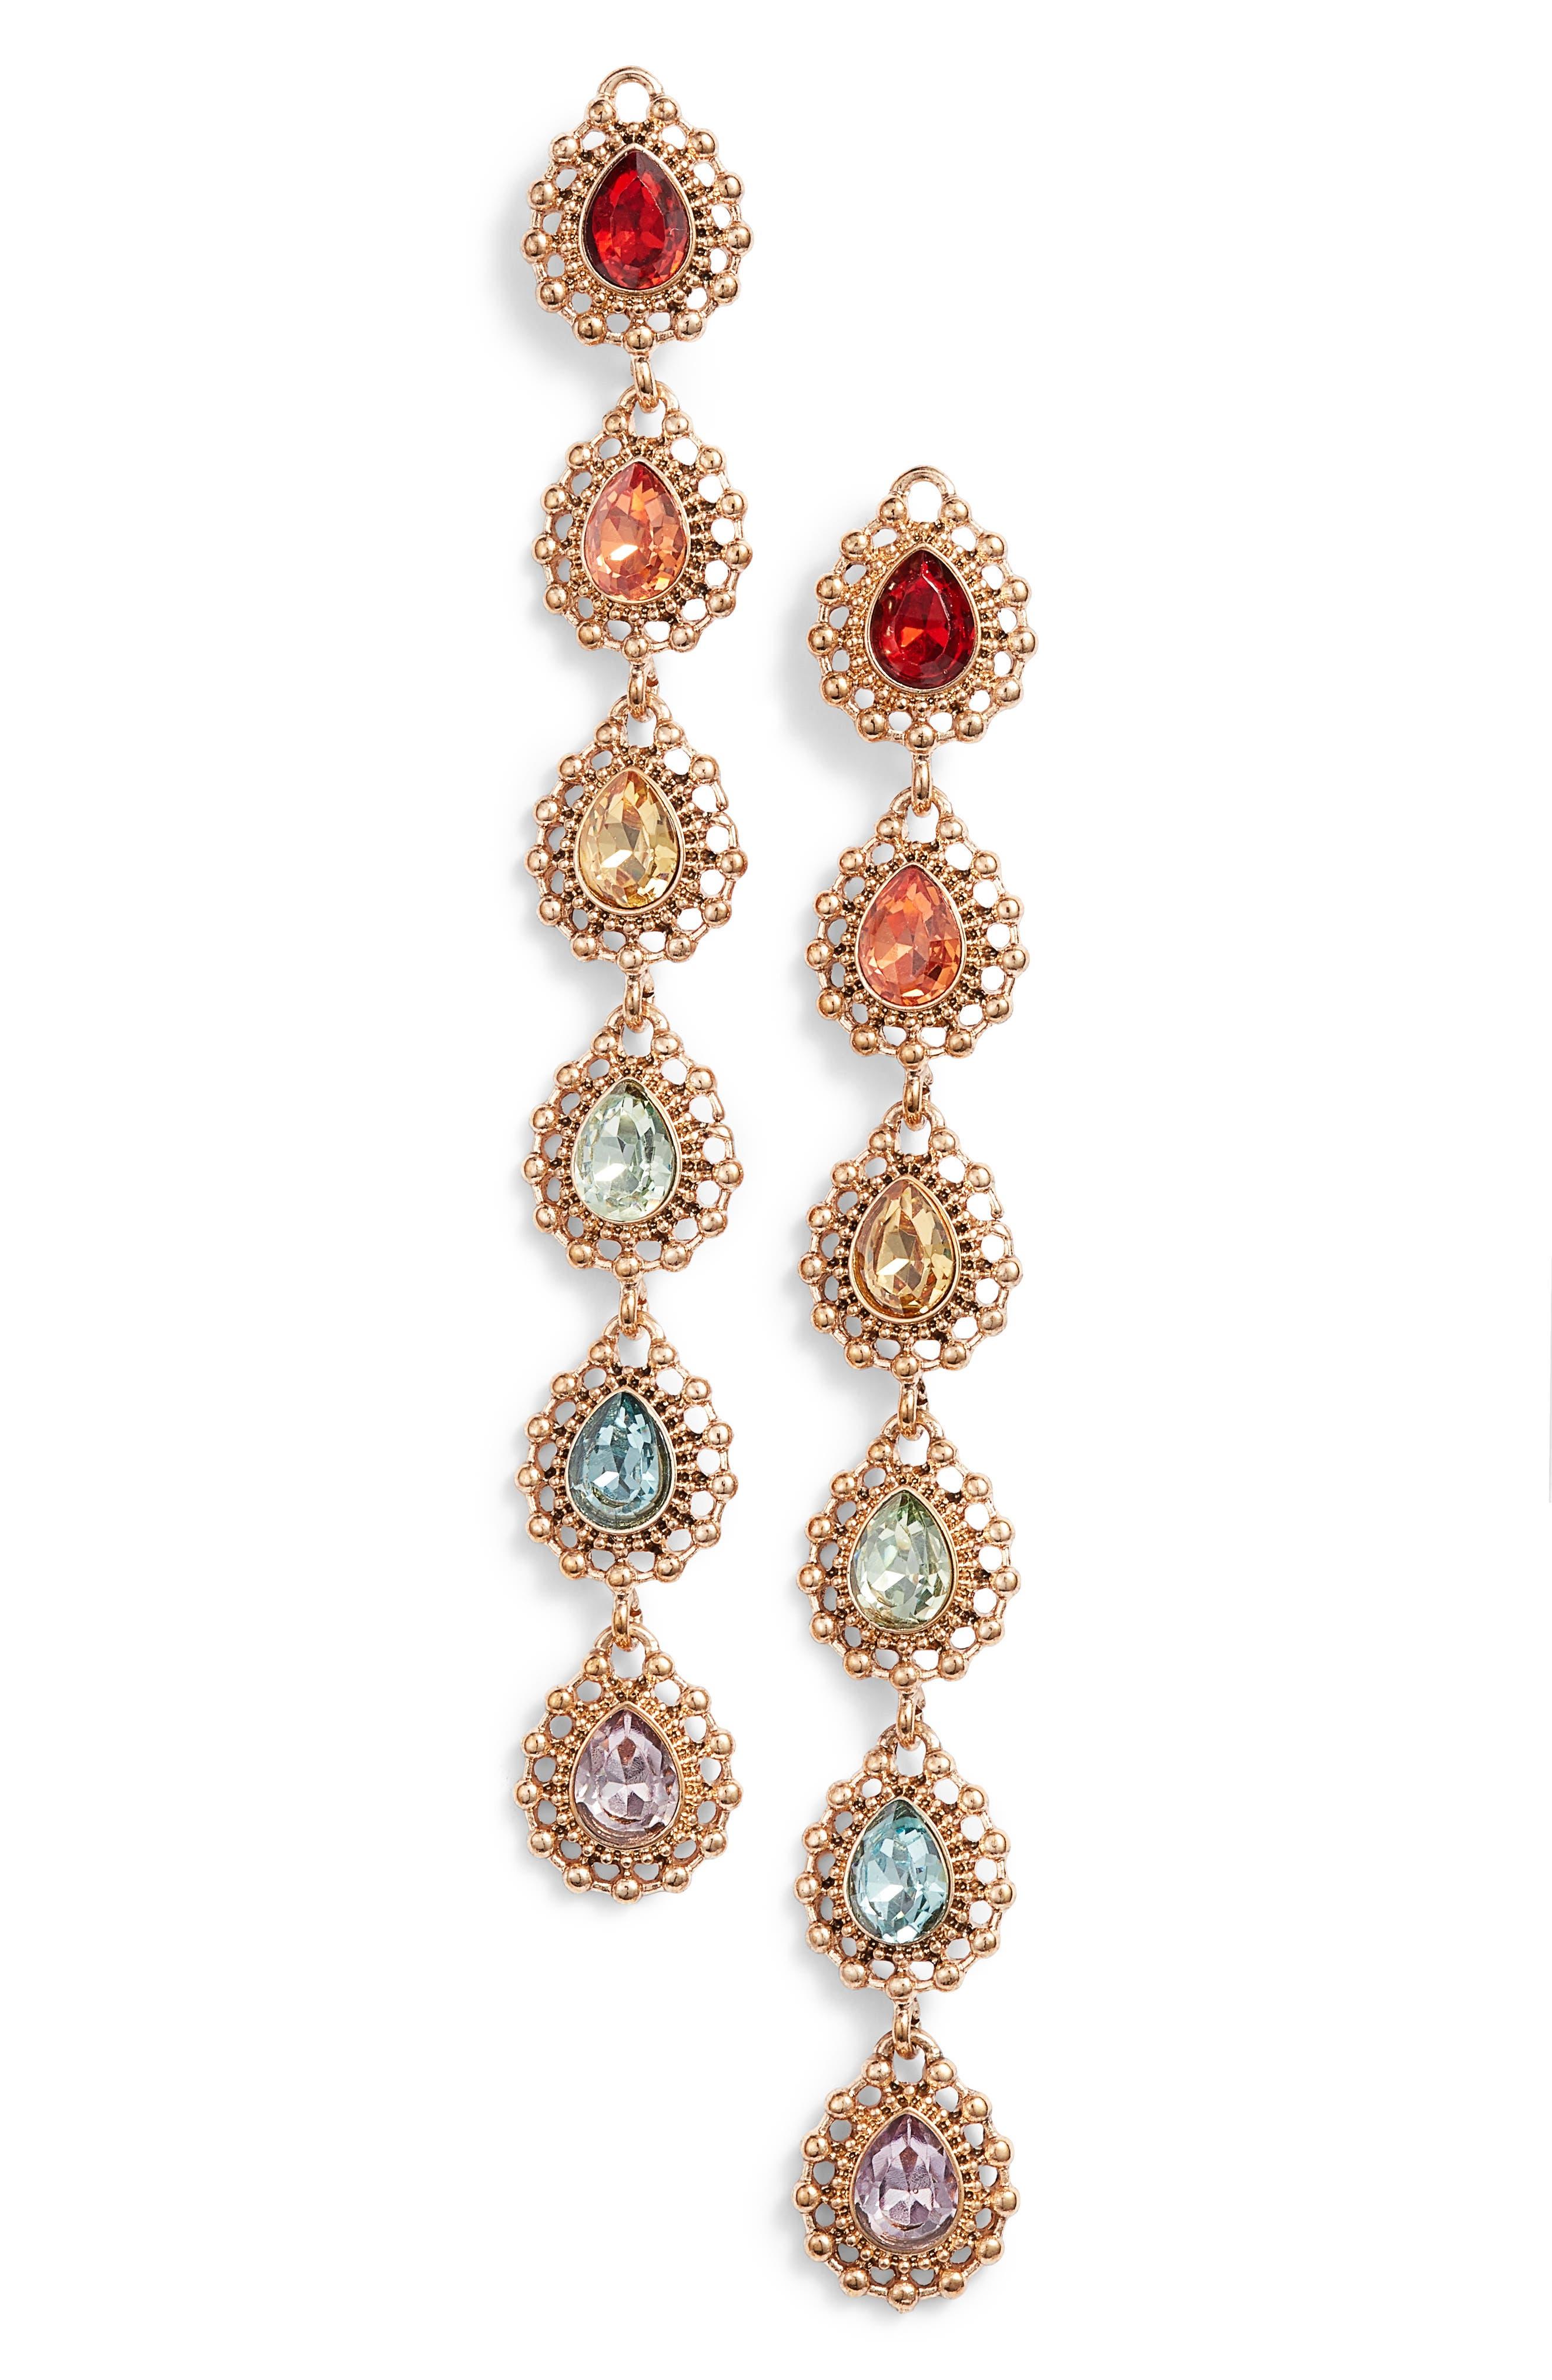 Ombré Crystal Drop Earrings,                             Main thumbnail 1, color,                             Gold/ Multi